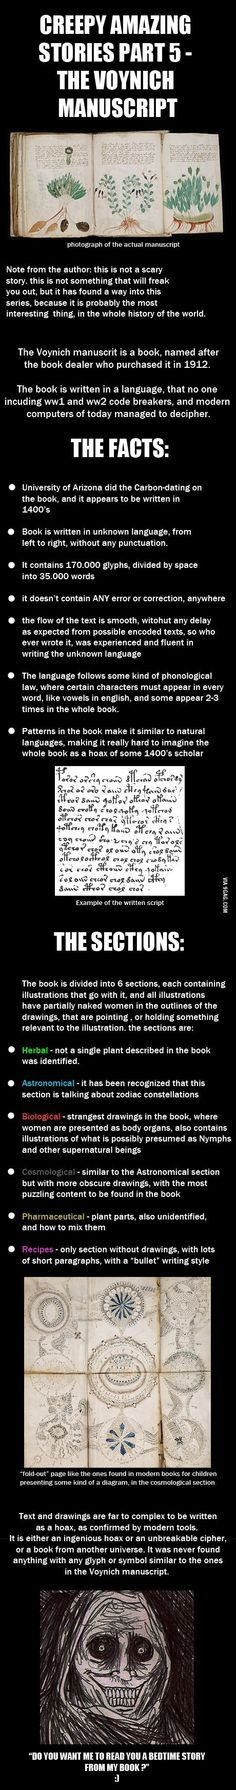 Creepy Amazing Stories - Voynich Manusript